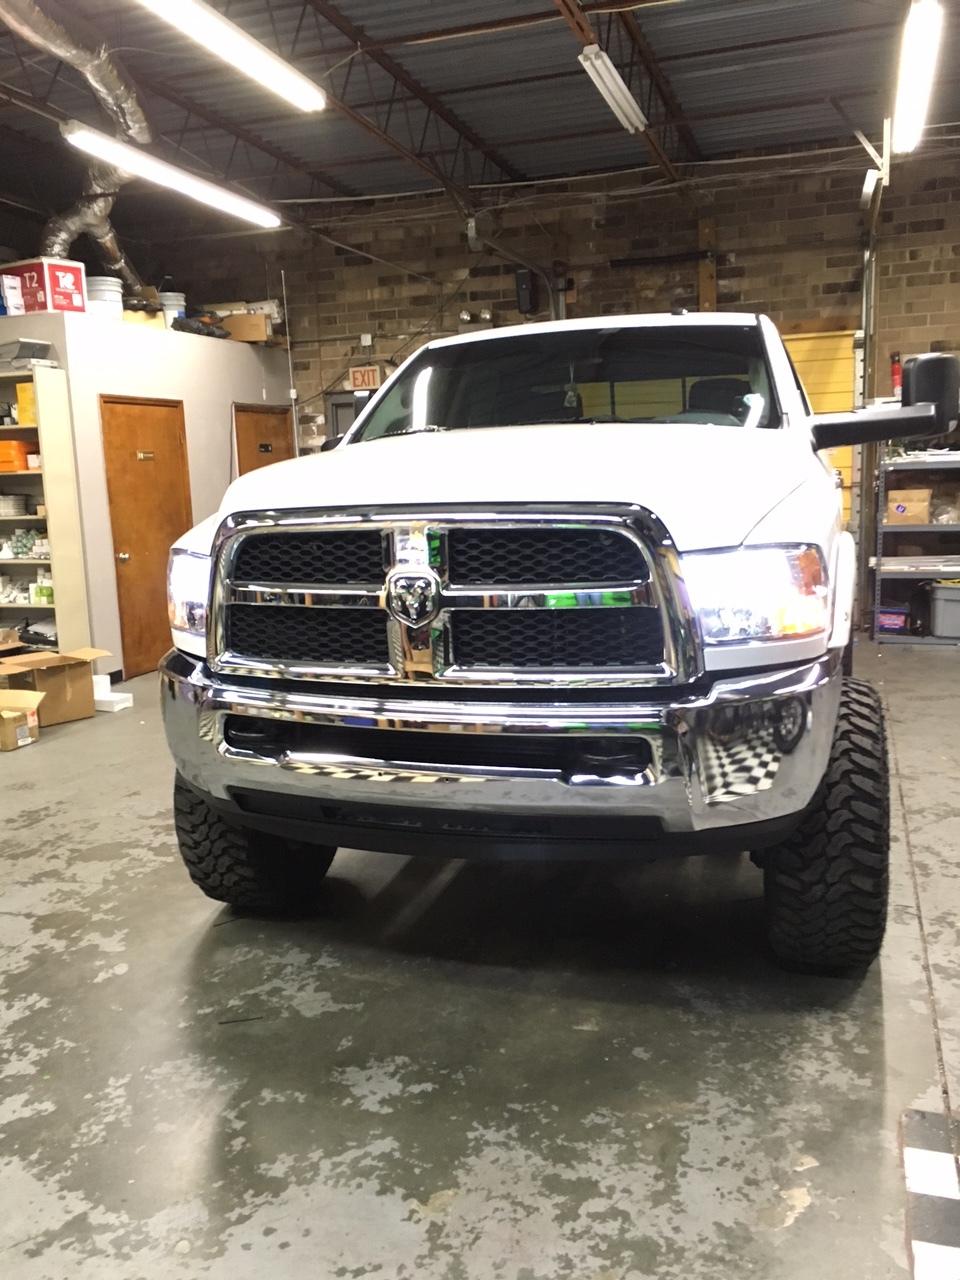 14 Dodge.JPG